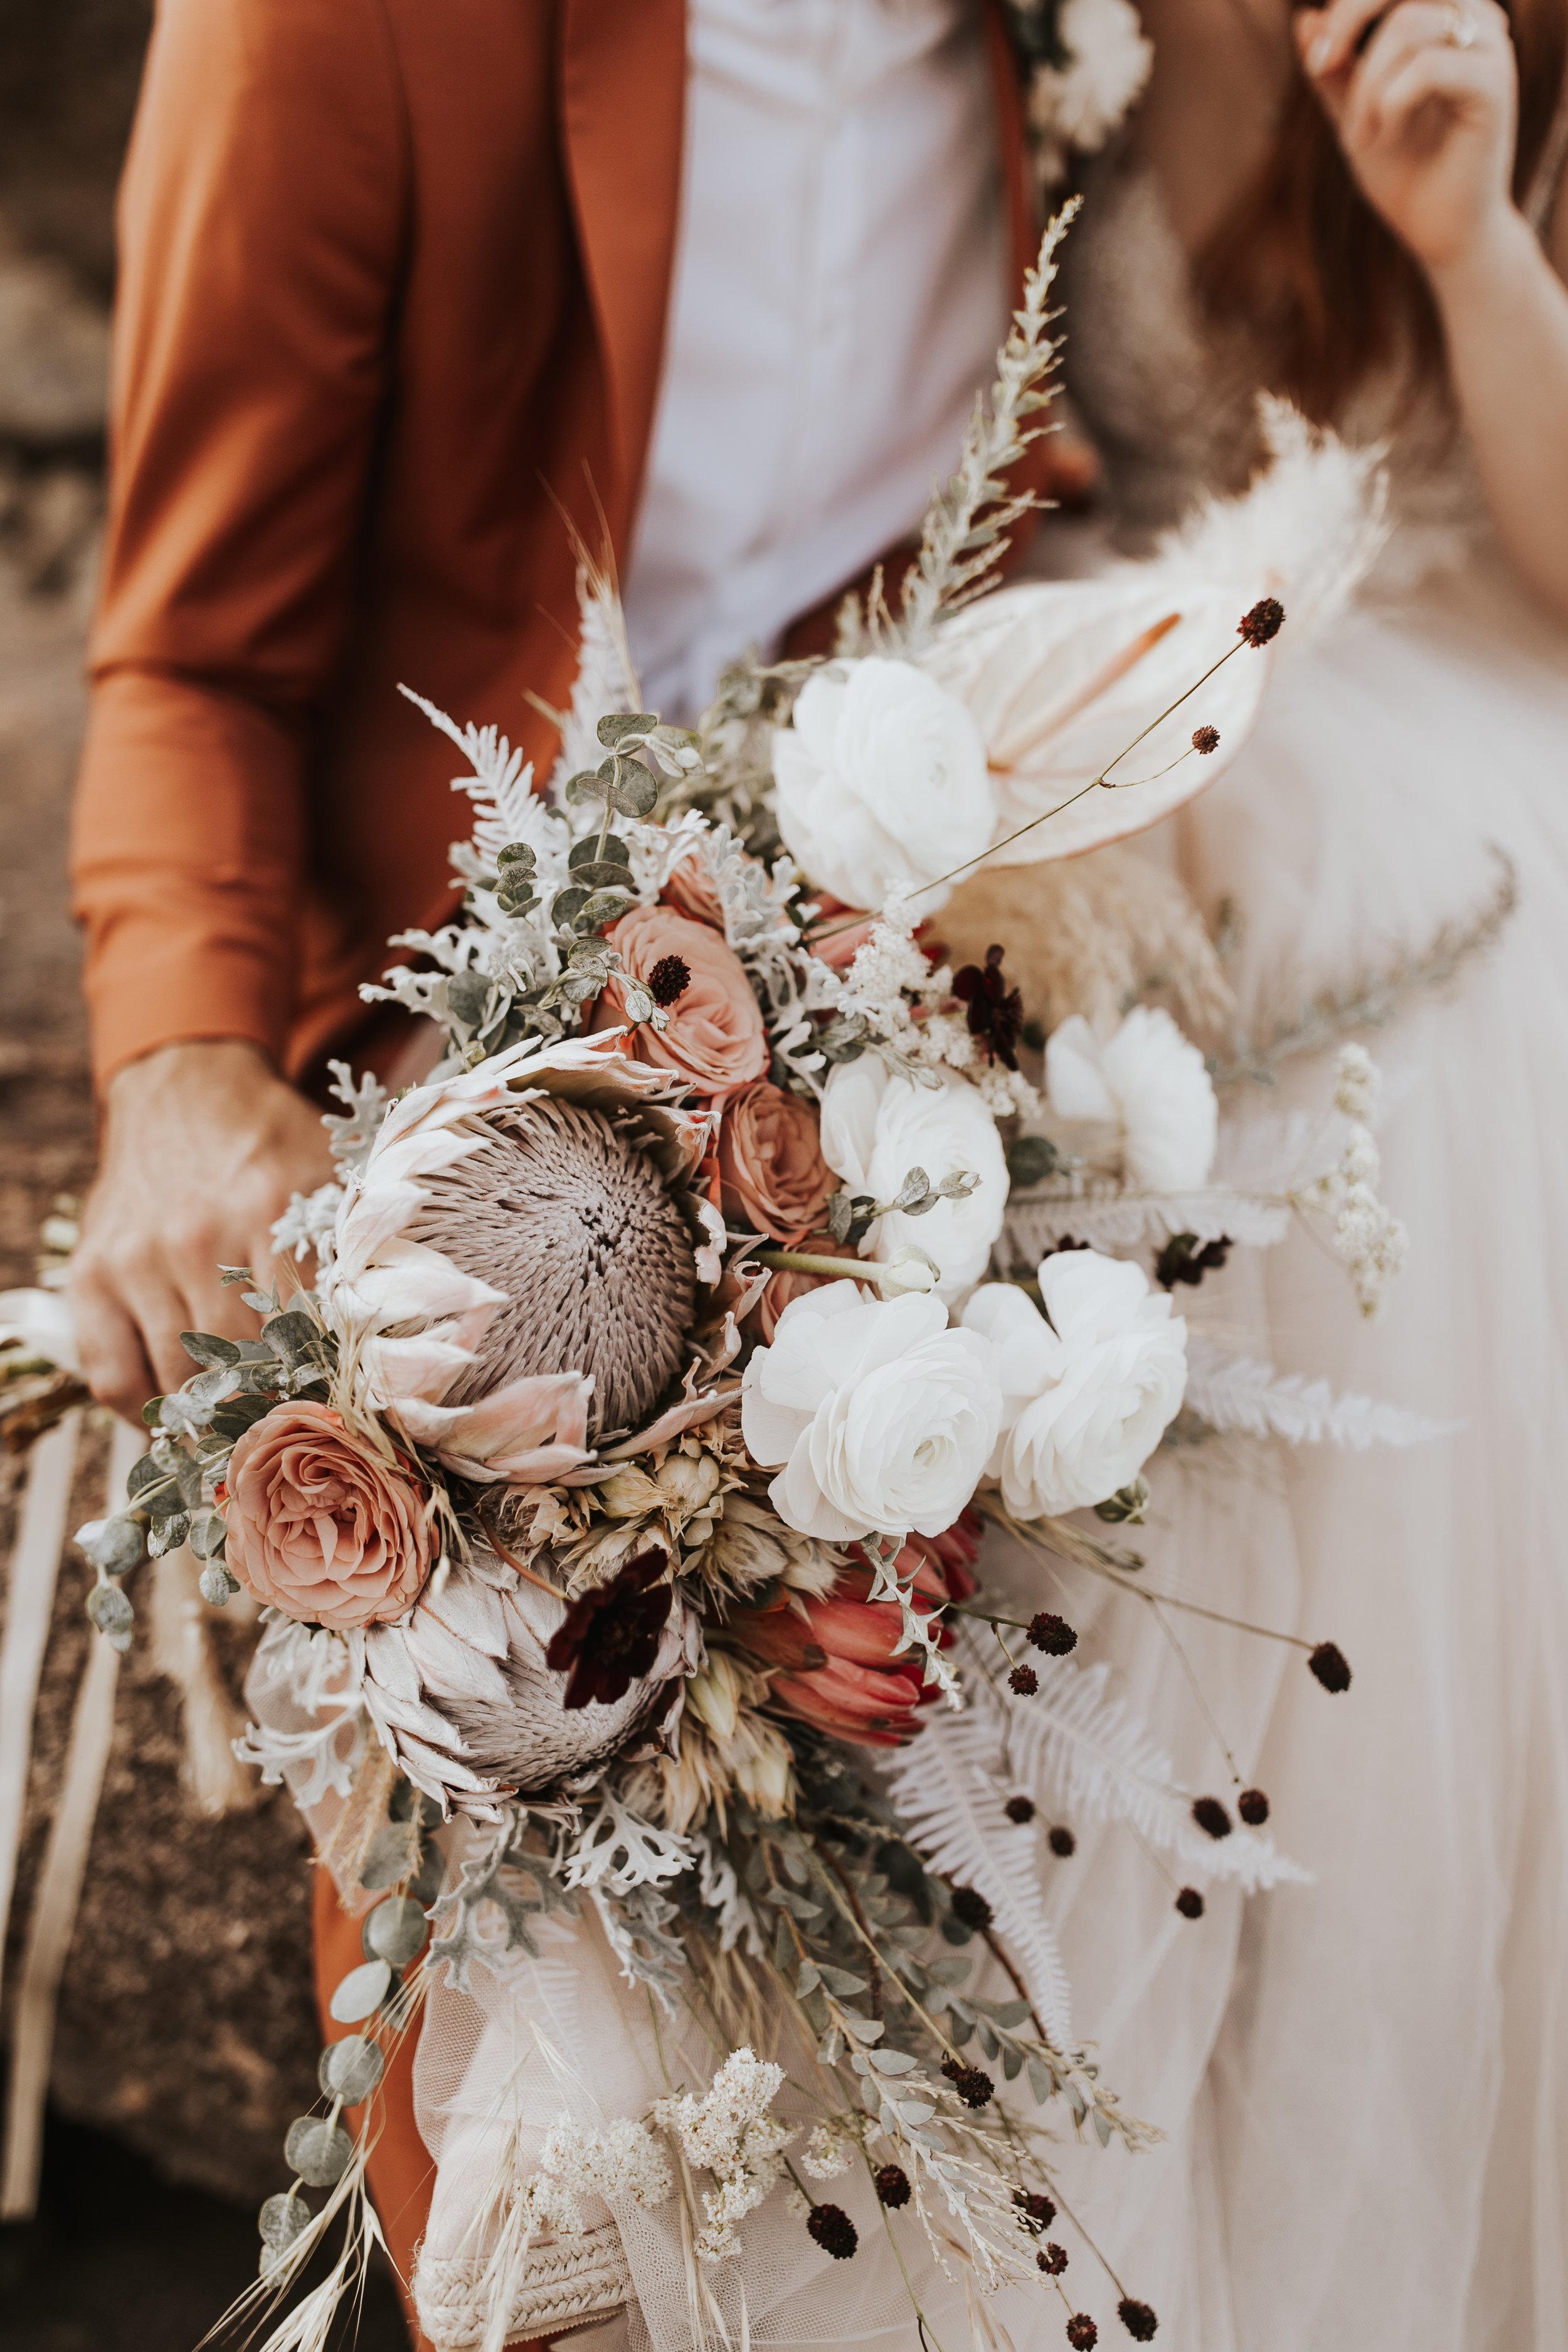 Emilie's Bouquet- Photo by Wild Heart Visuals (Nicole Little)